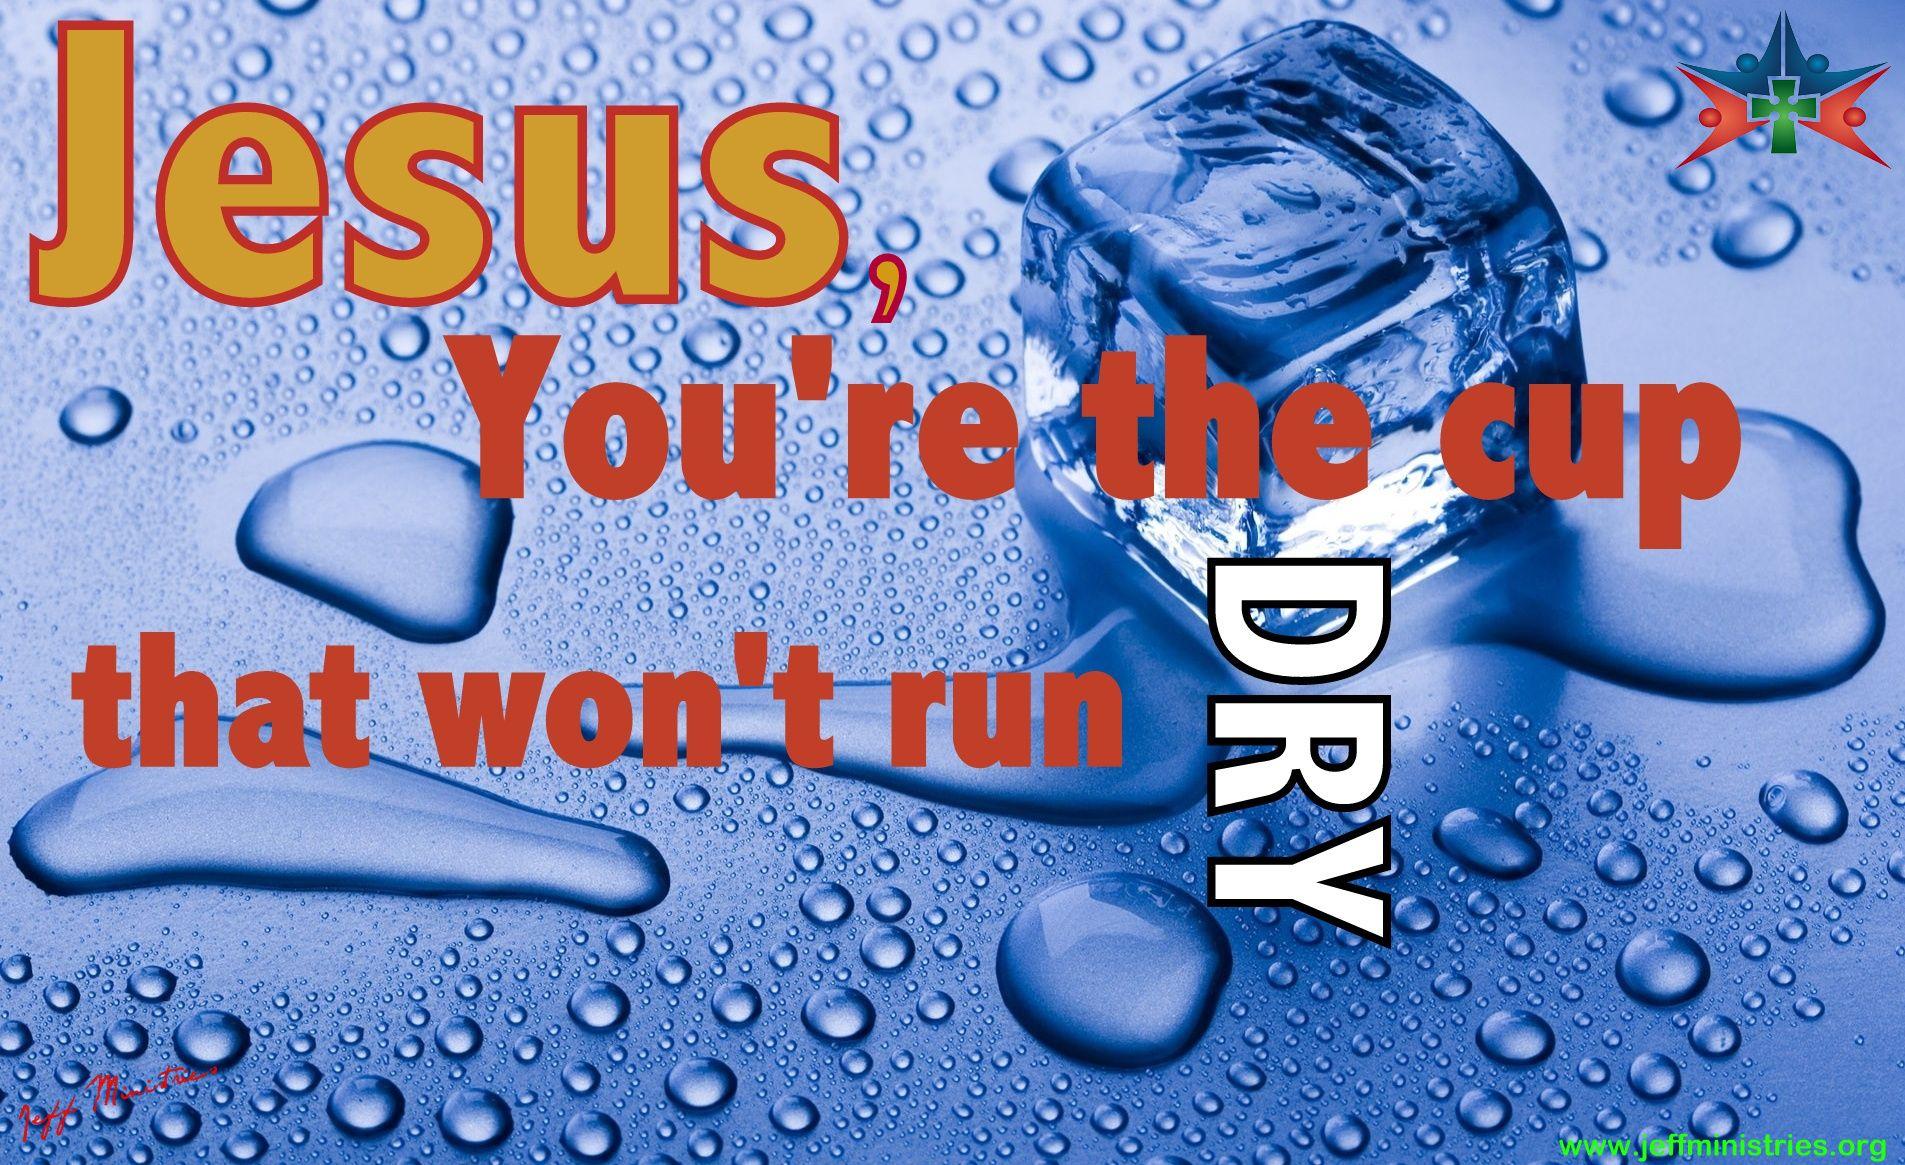 His love never runs dry